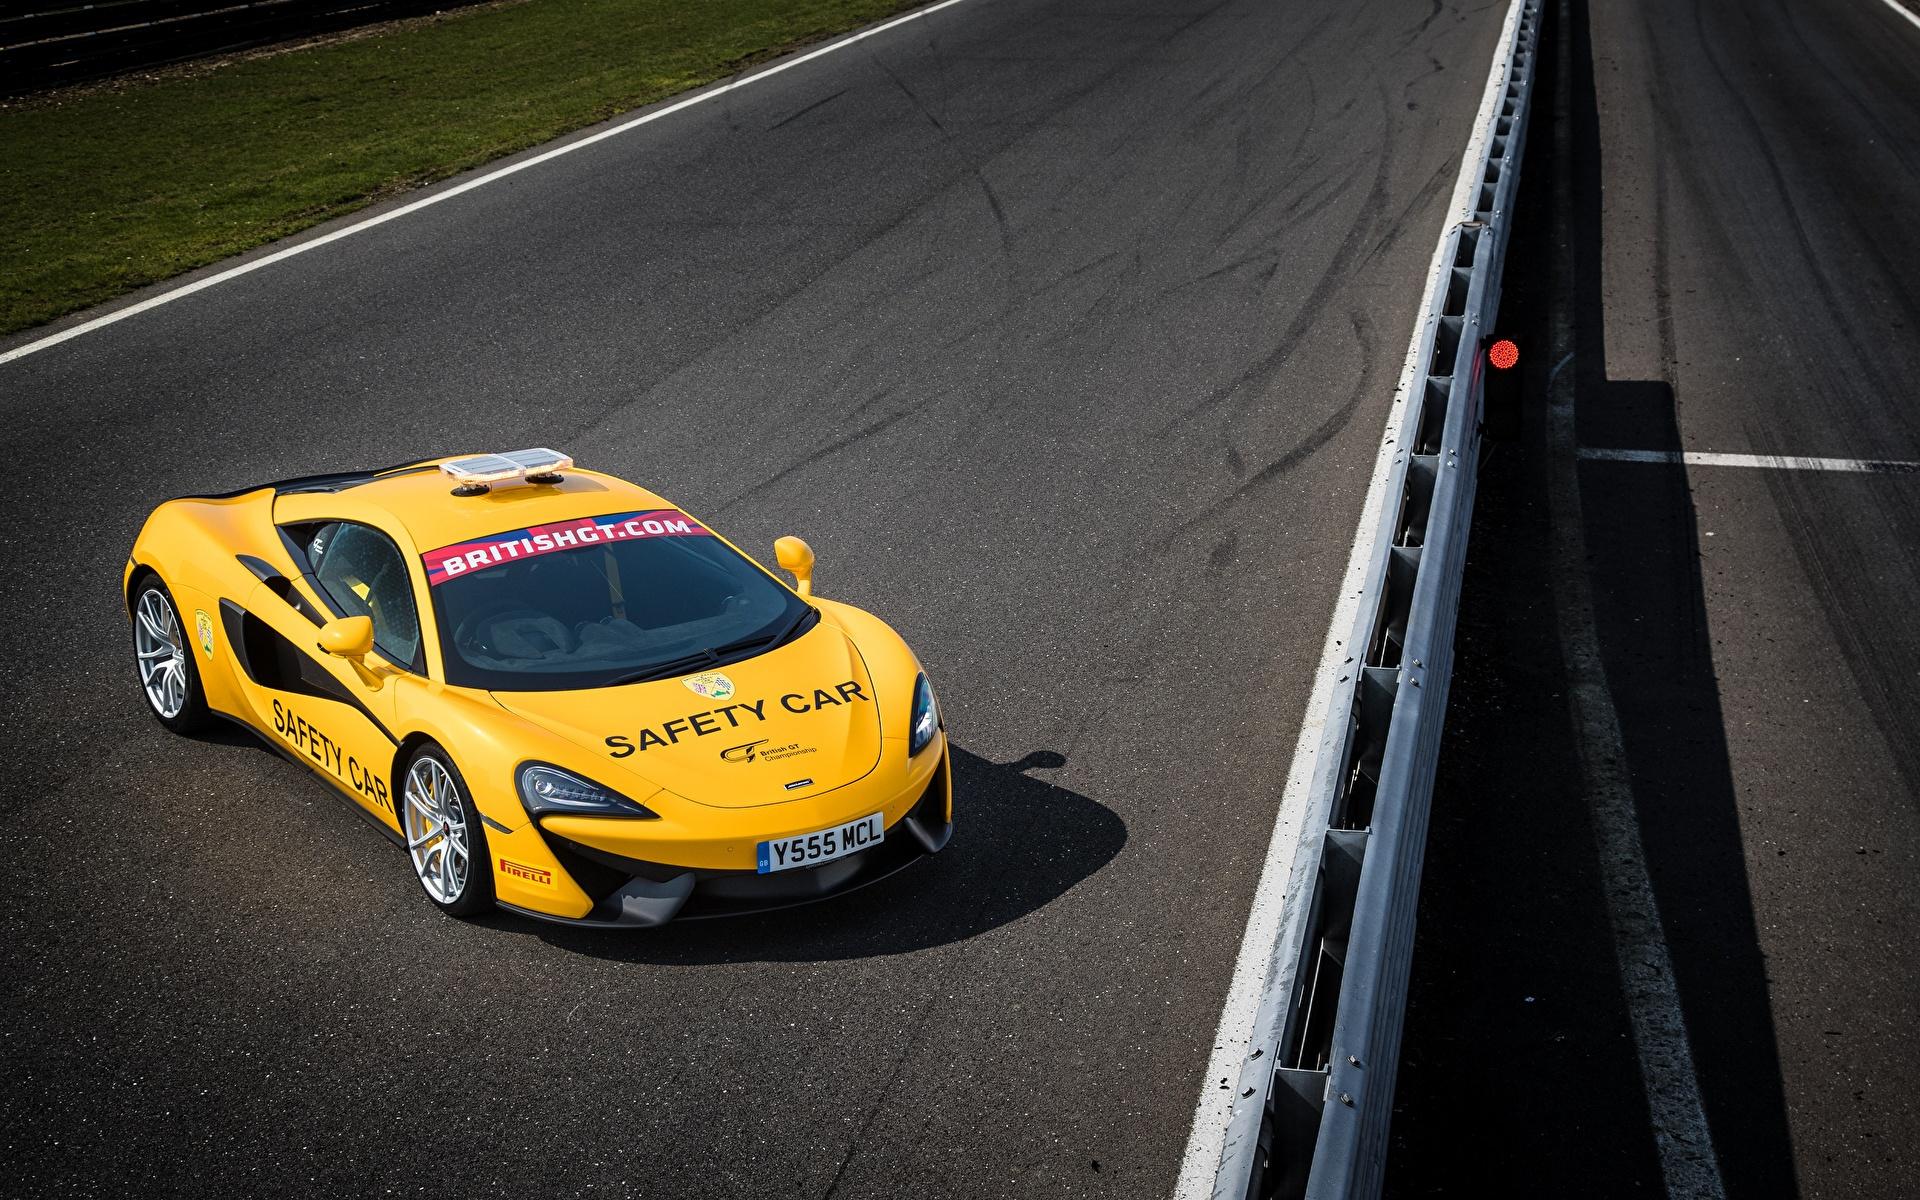 Afbeeldingen Tuning McLaren 2017 540C Coupe Safety Car Geel kleur auto's 1920x1200 Auto automobiel